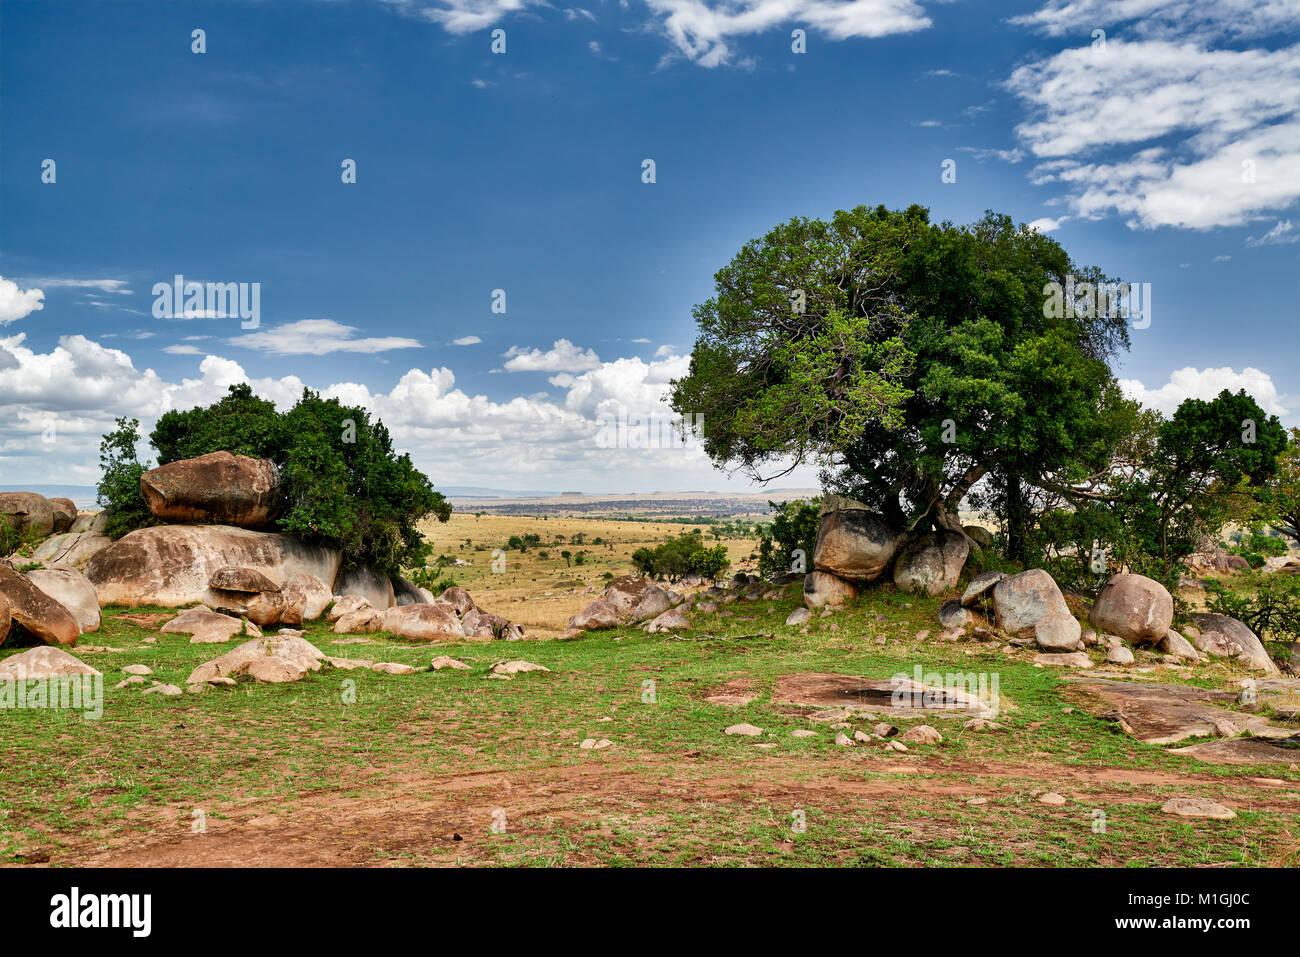 Paysage du Parc National de Serengeti, UNESCO World Heritage site, Tanzania, Africa Photo Stock